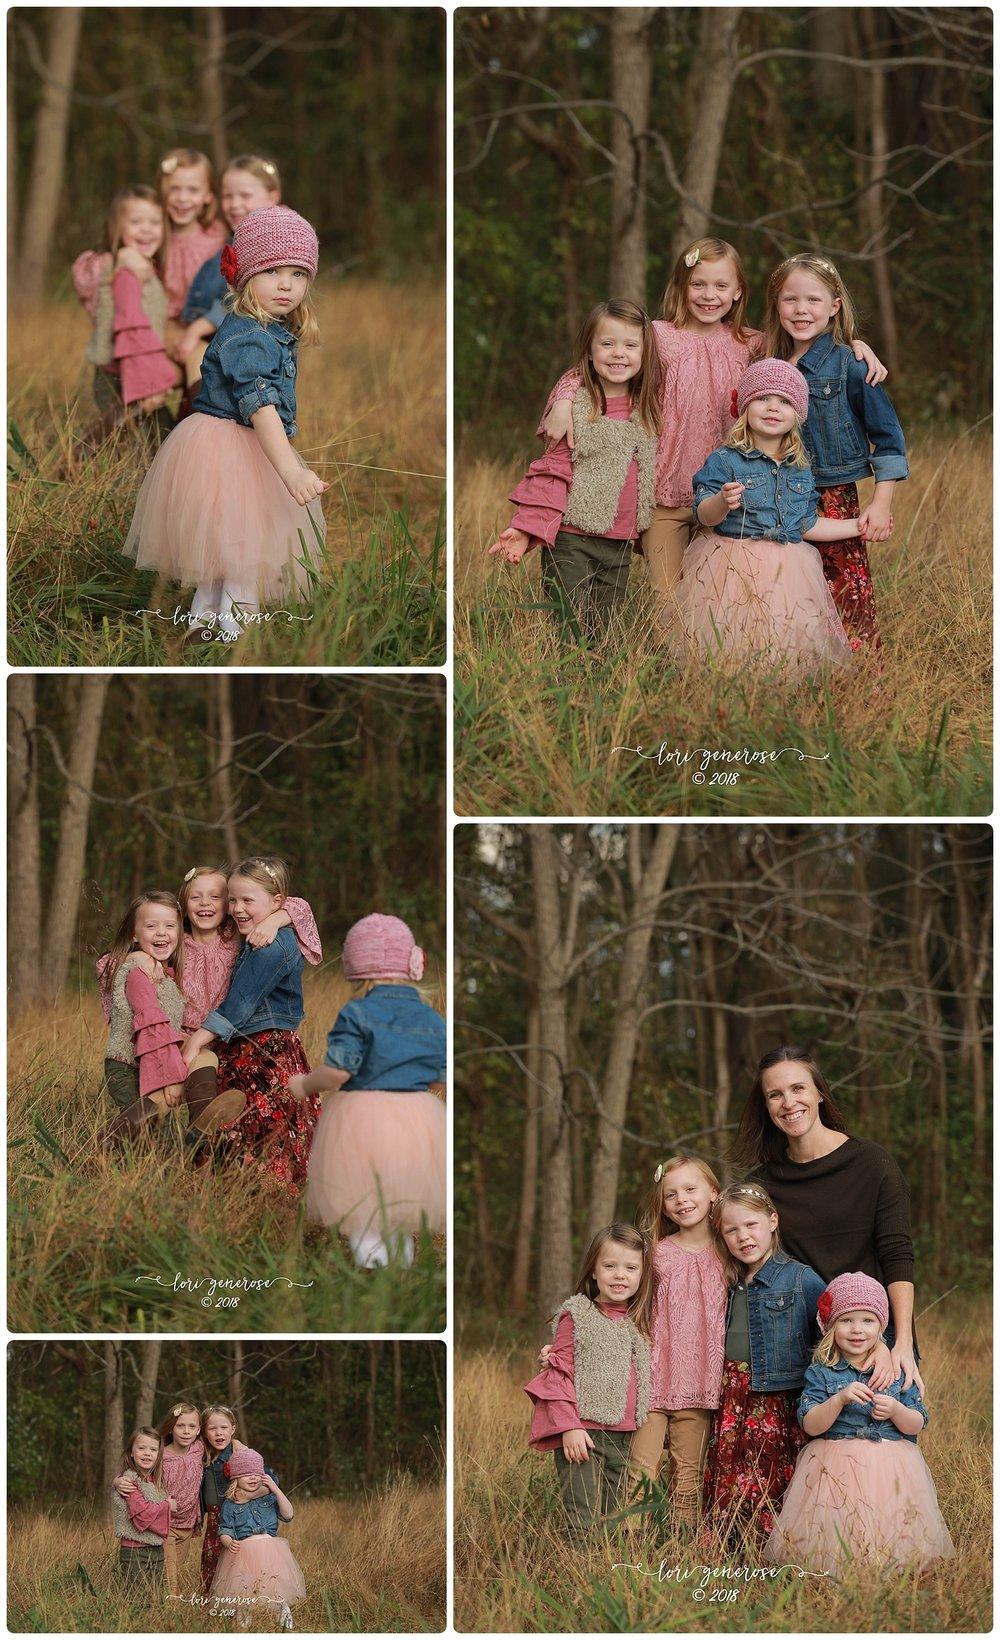 lgphotographylorigenerosespringtonmanorfarmglenmoorepafallfamilysessioninctobersisters.jpg